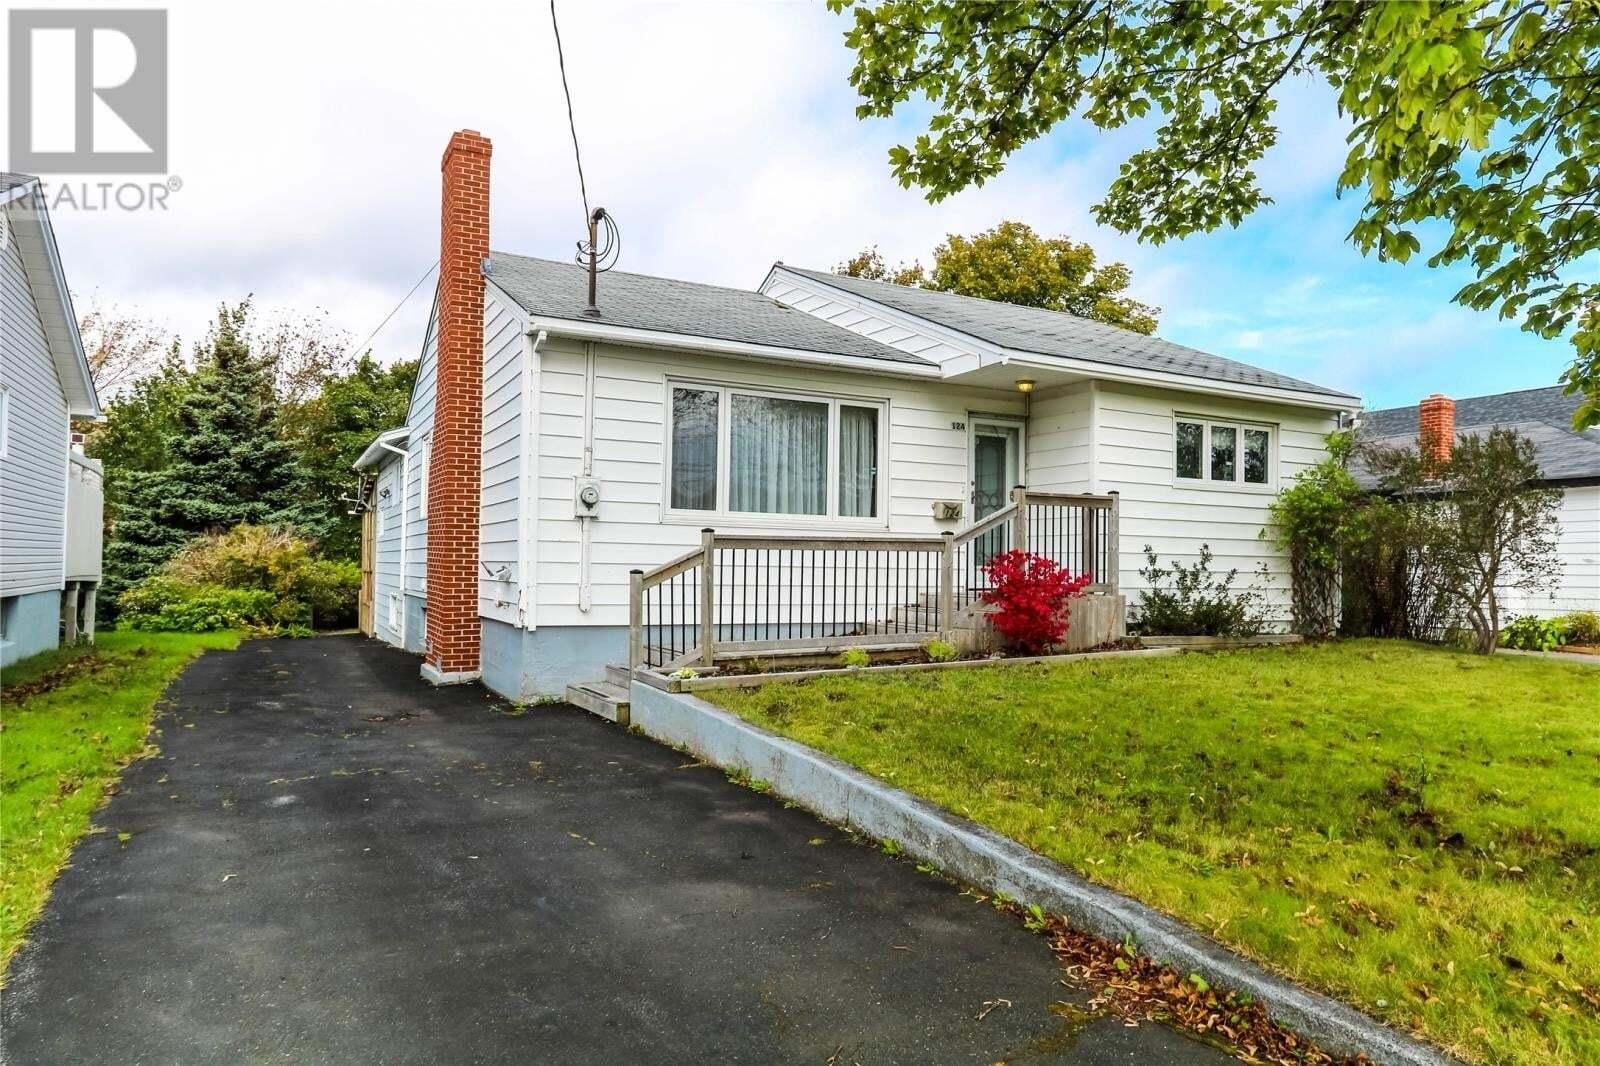 House for sale at 124 University Ave St. John's Newfoundland - MLS: 1221758